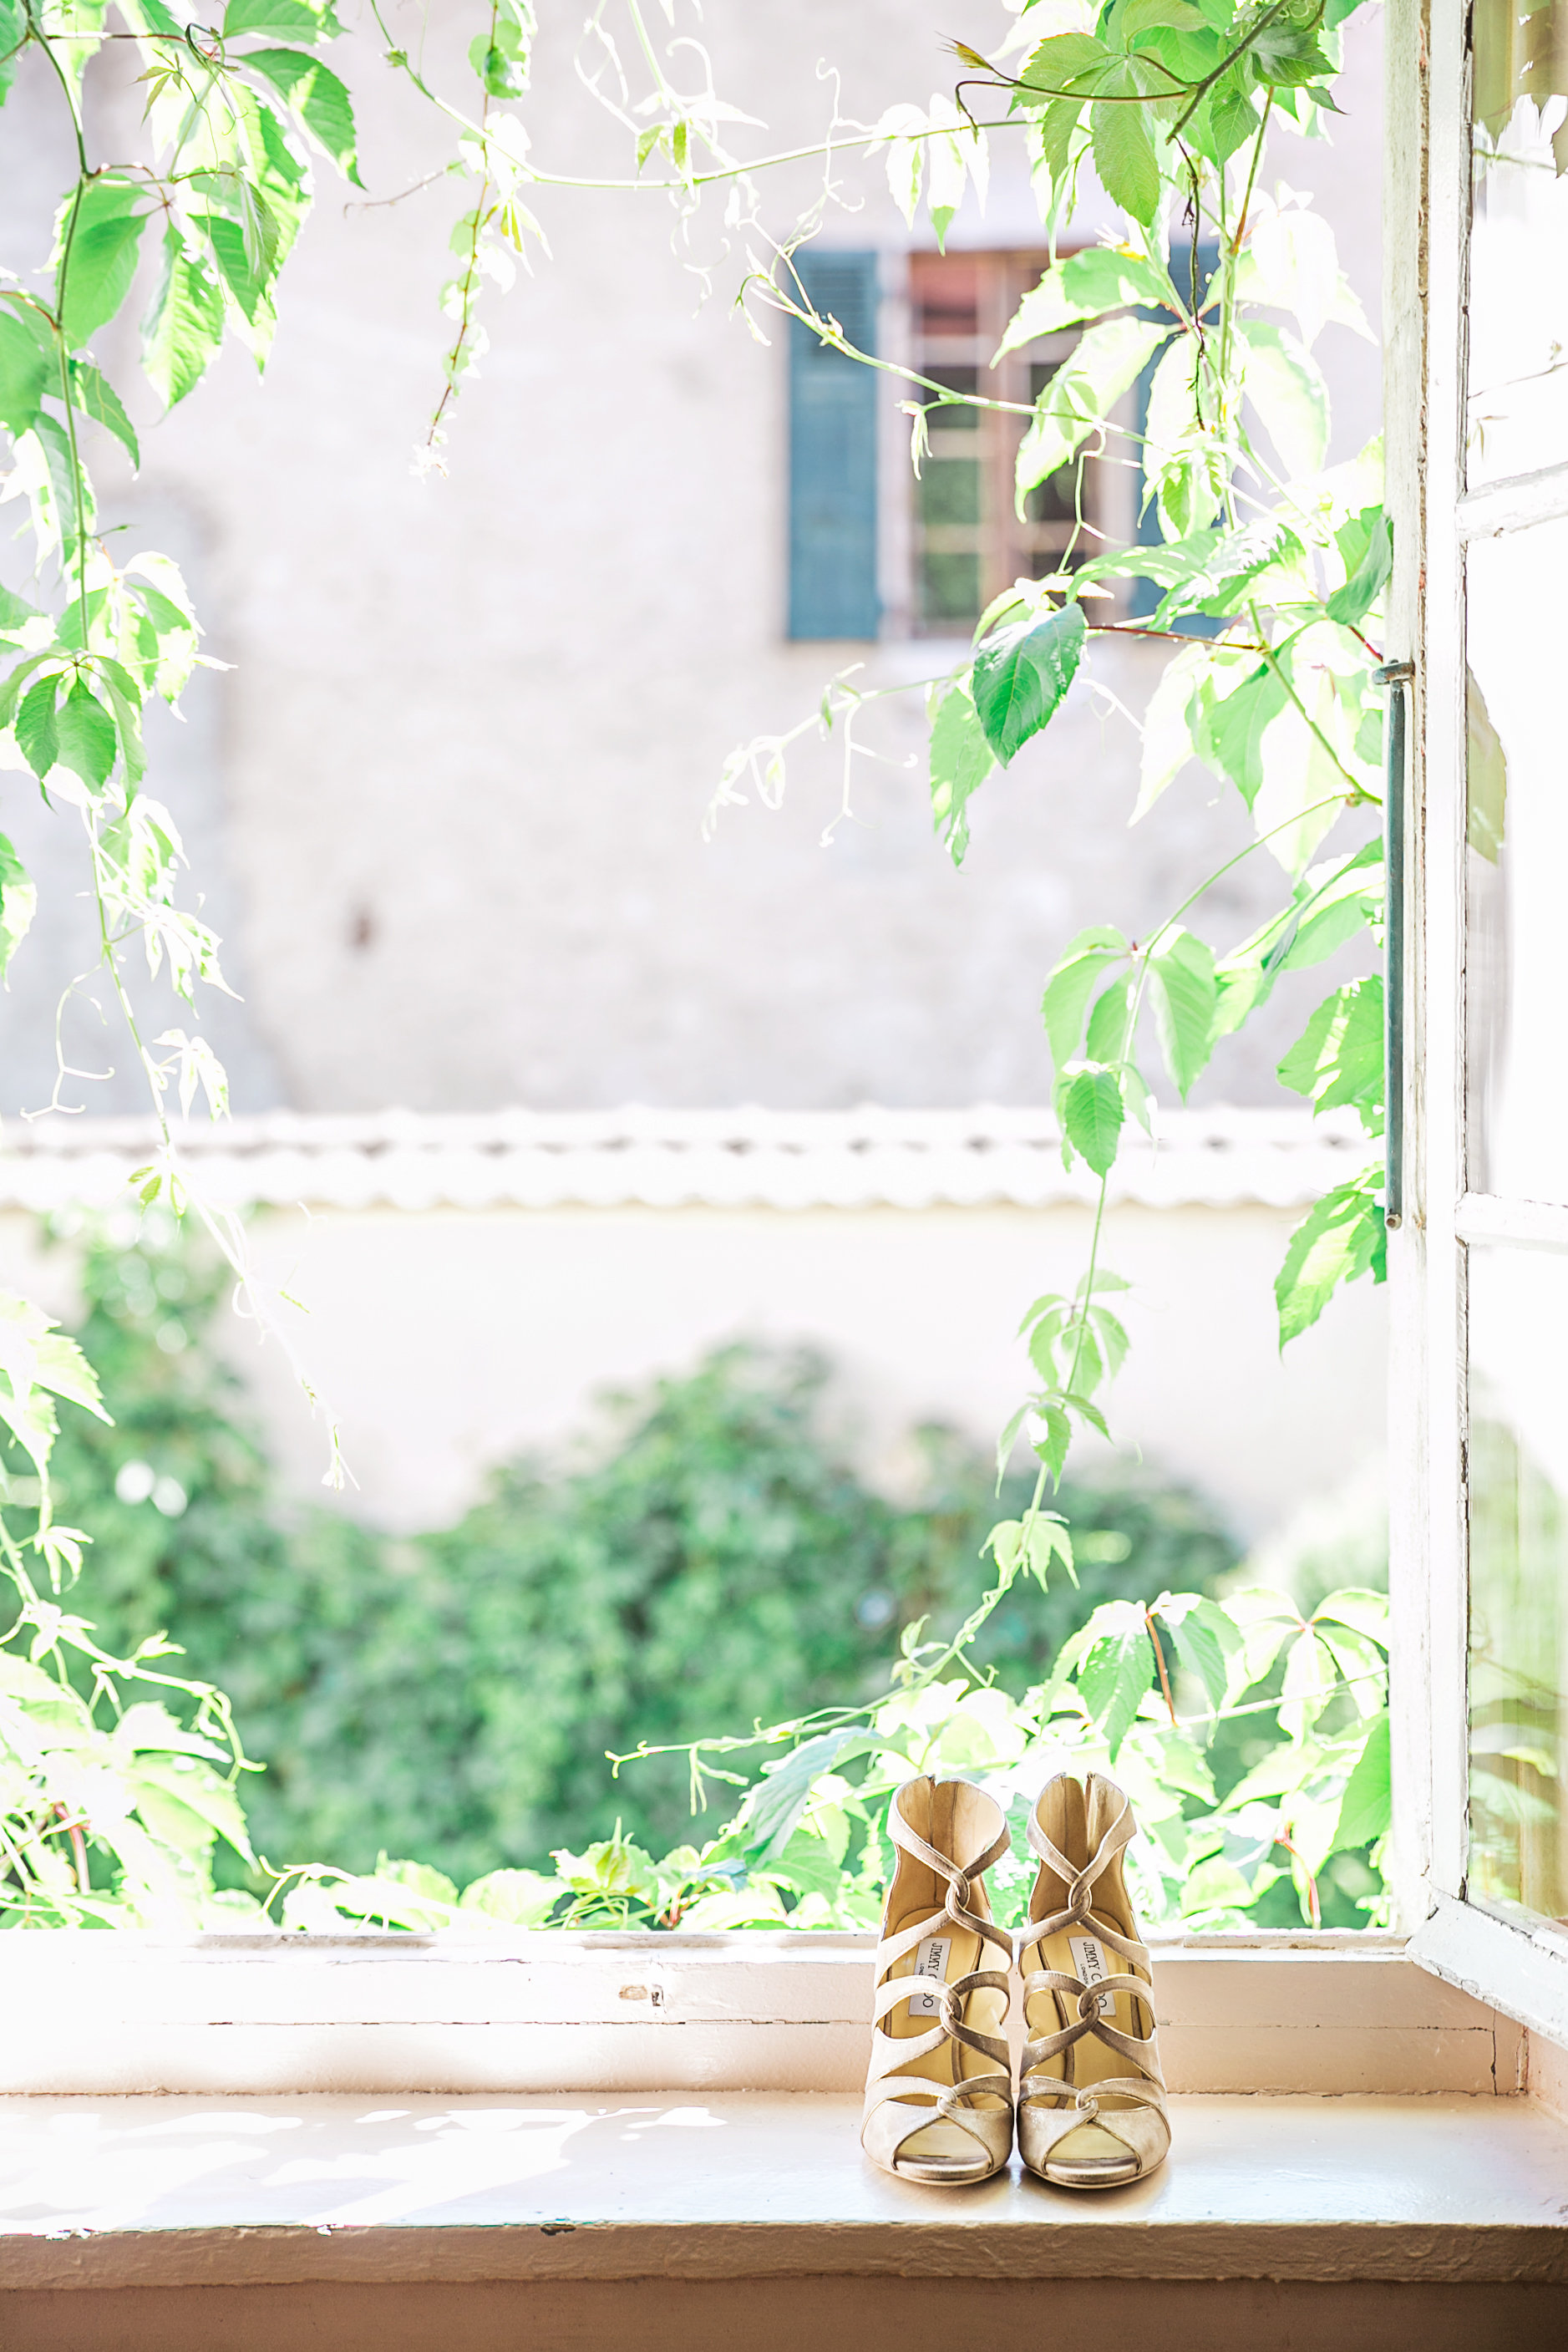 French destination wedding, Talloires, France,Annecy, French Alps,Abbaye de Talloires, blush and ivory wedding, destination wedding, french destination wedding, Lake Annecy, Talloires: France, Lac d'annecy, Wedding planner, destination wedding planner, Italian wedding planner, french wedding planner, wedding, wedding inspiration, french wedding, italian wedding, manhattan wedding planner, lake wedding, european destination wedding,